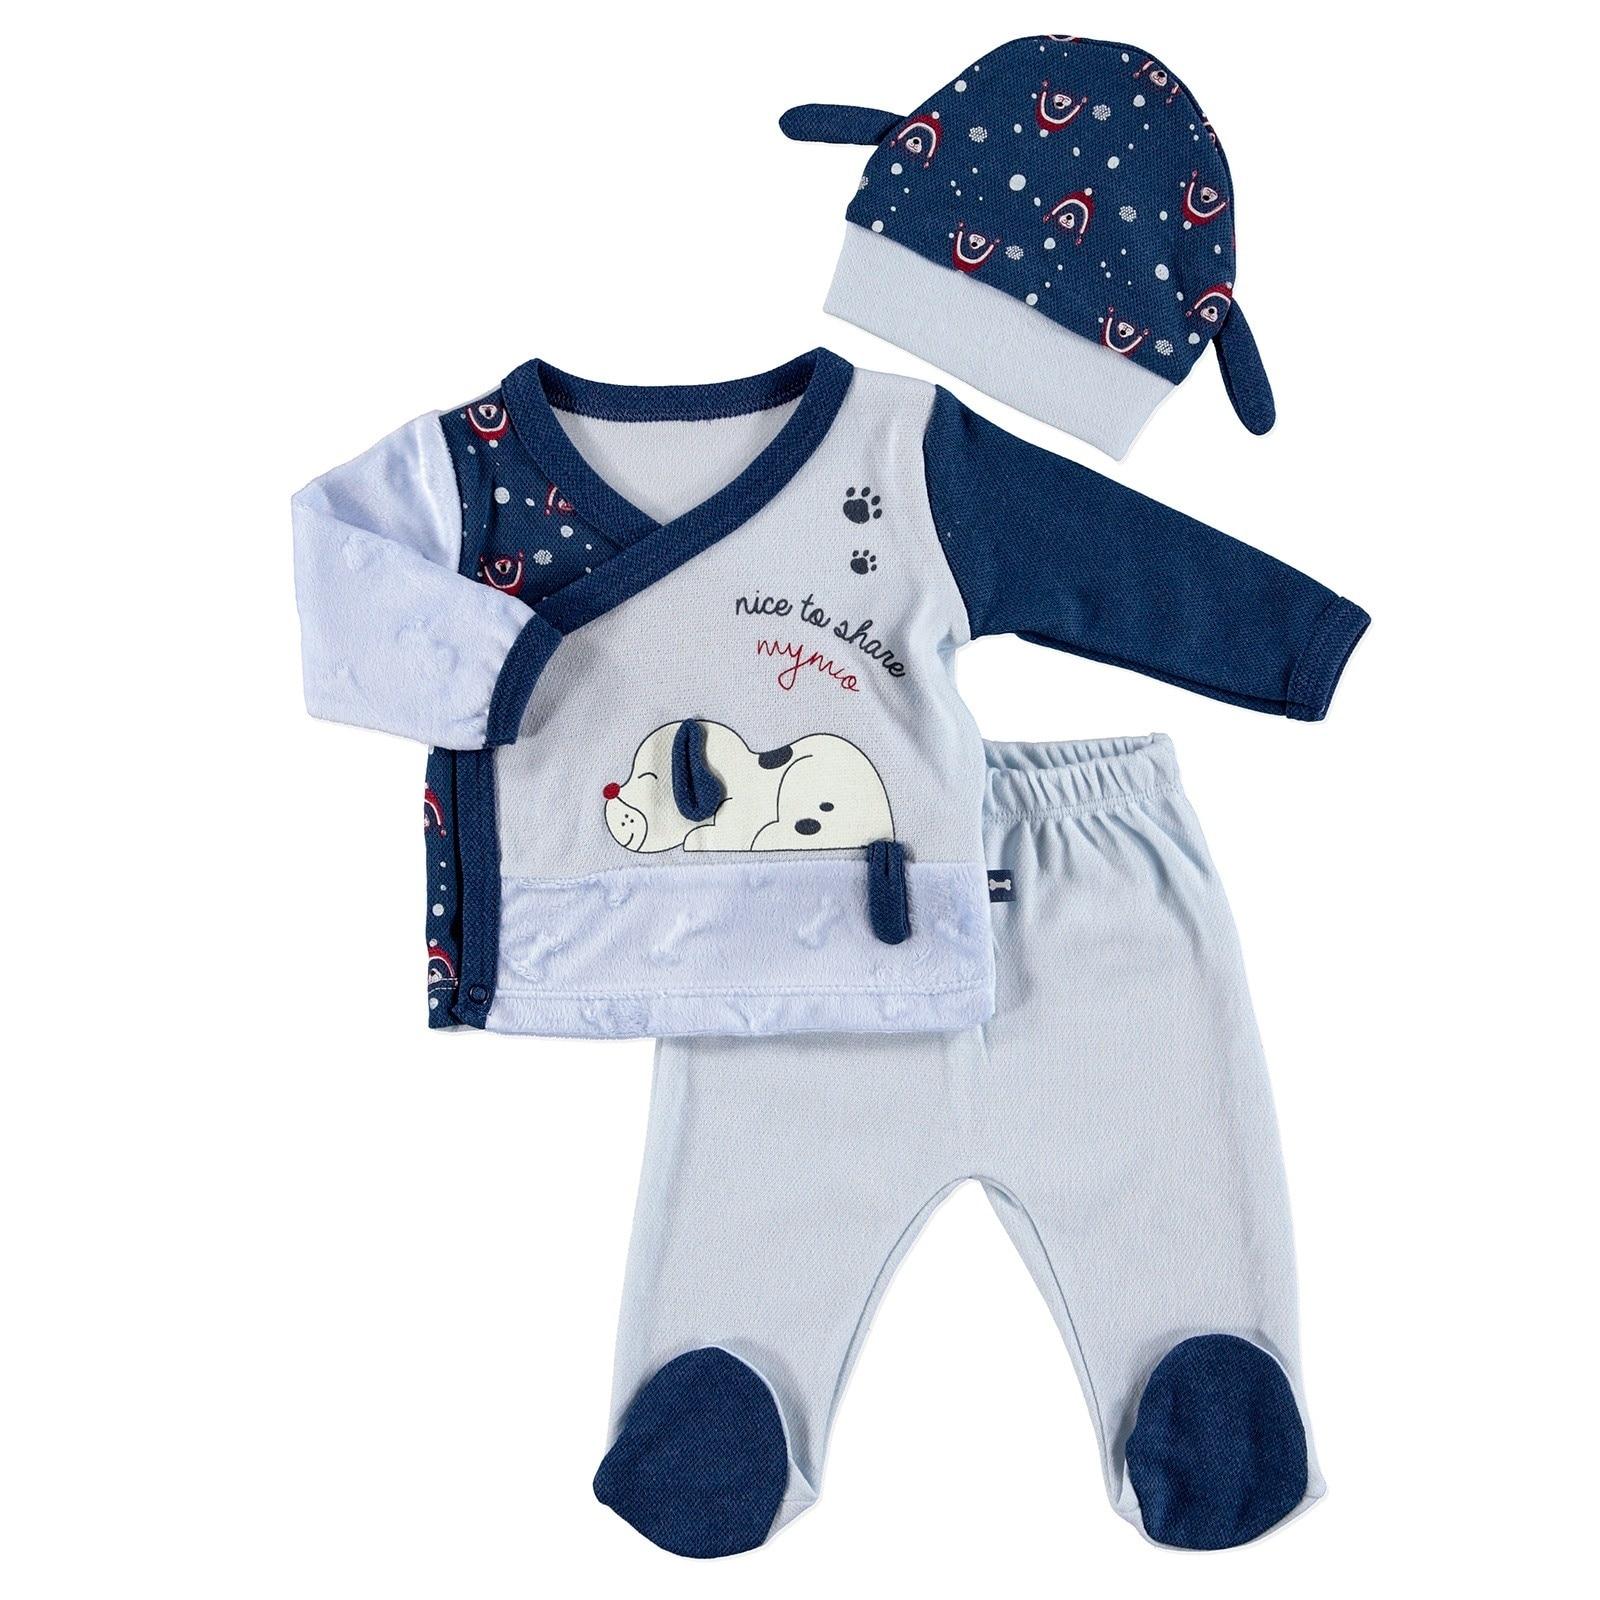 Ebebek Mymio Puppy Baby Bodysuit Footed Pants Hat 3 Pcs Set